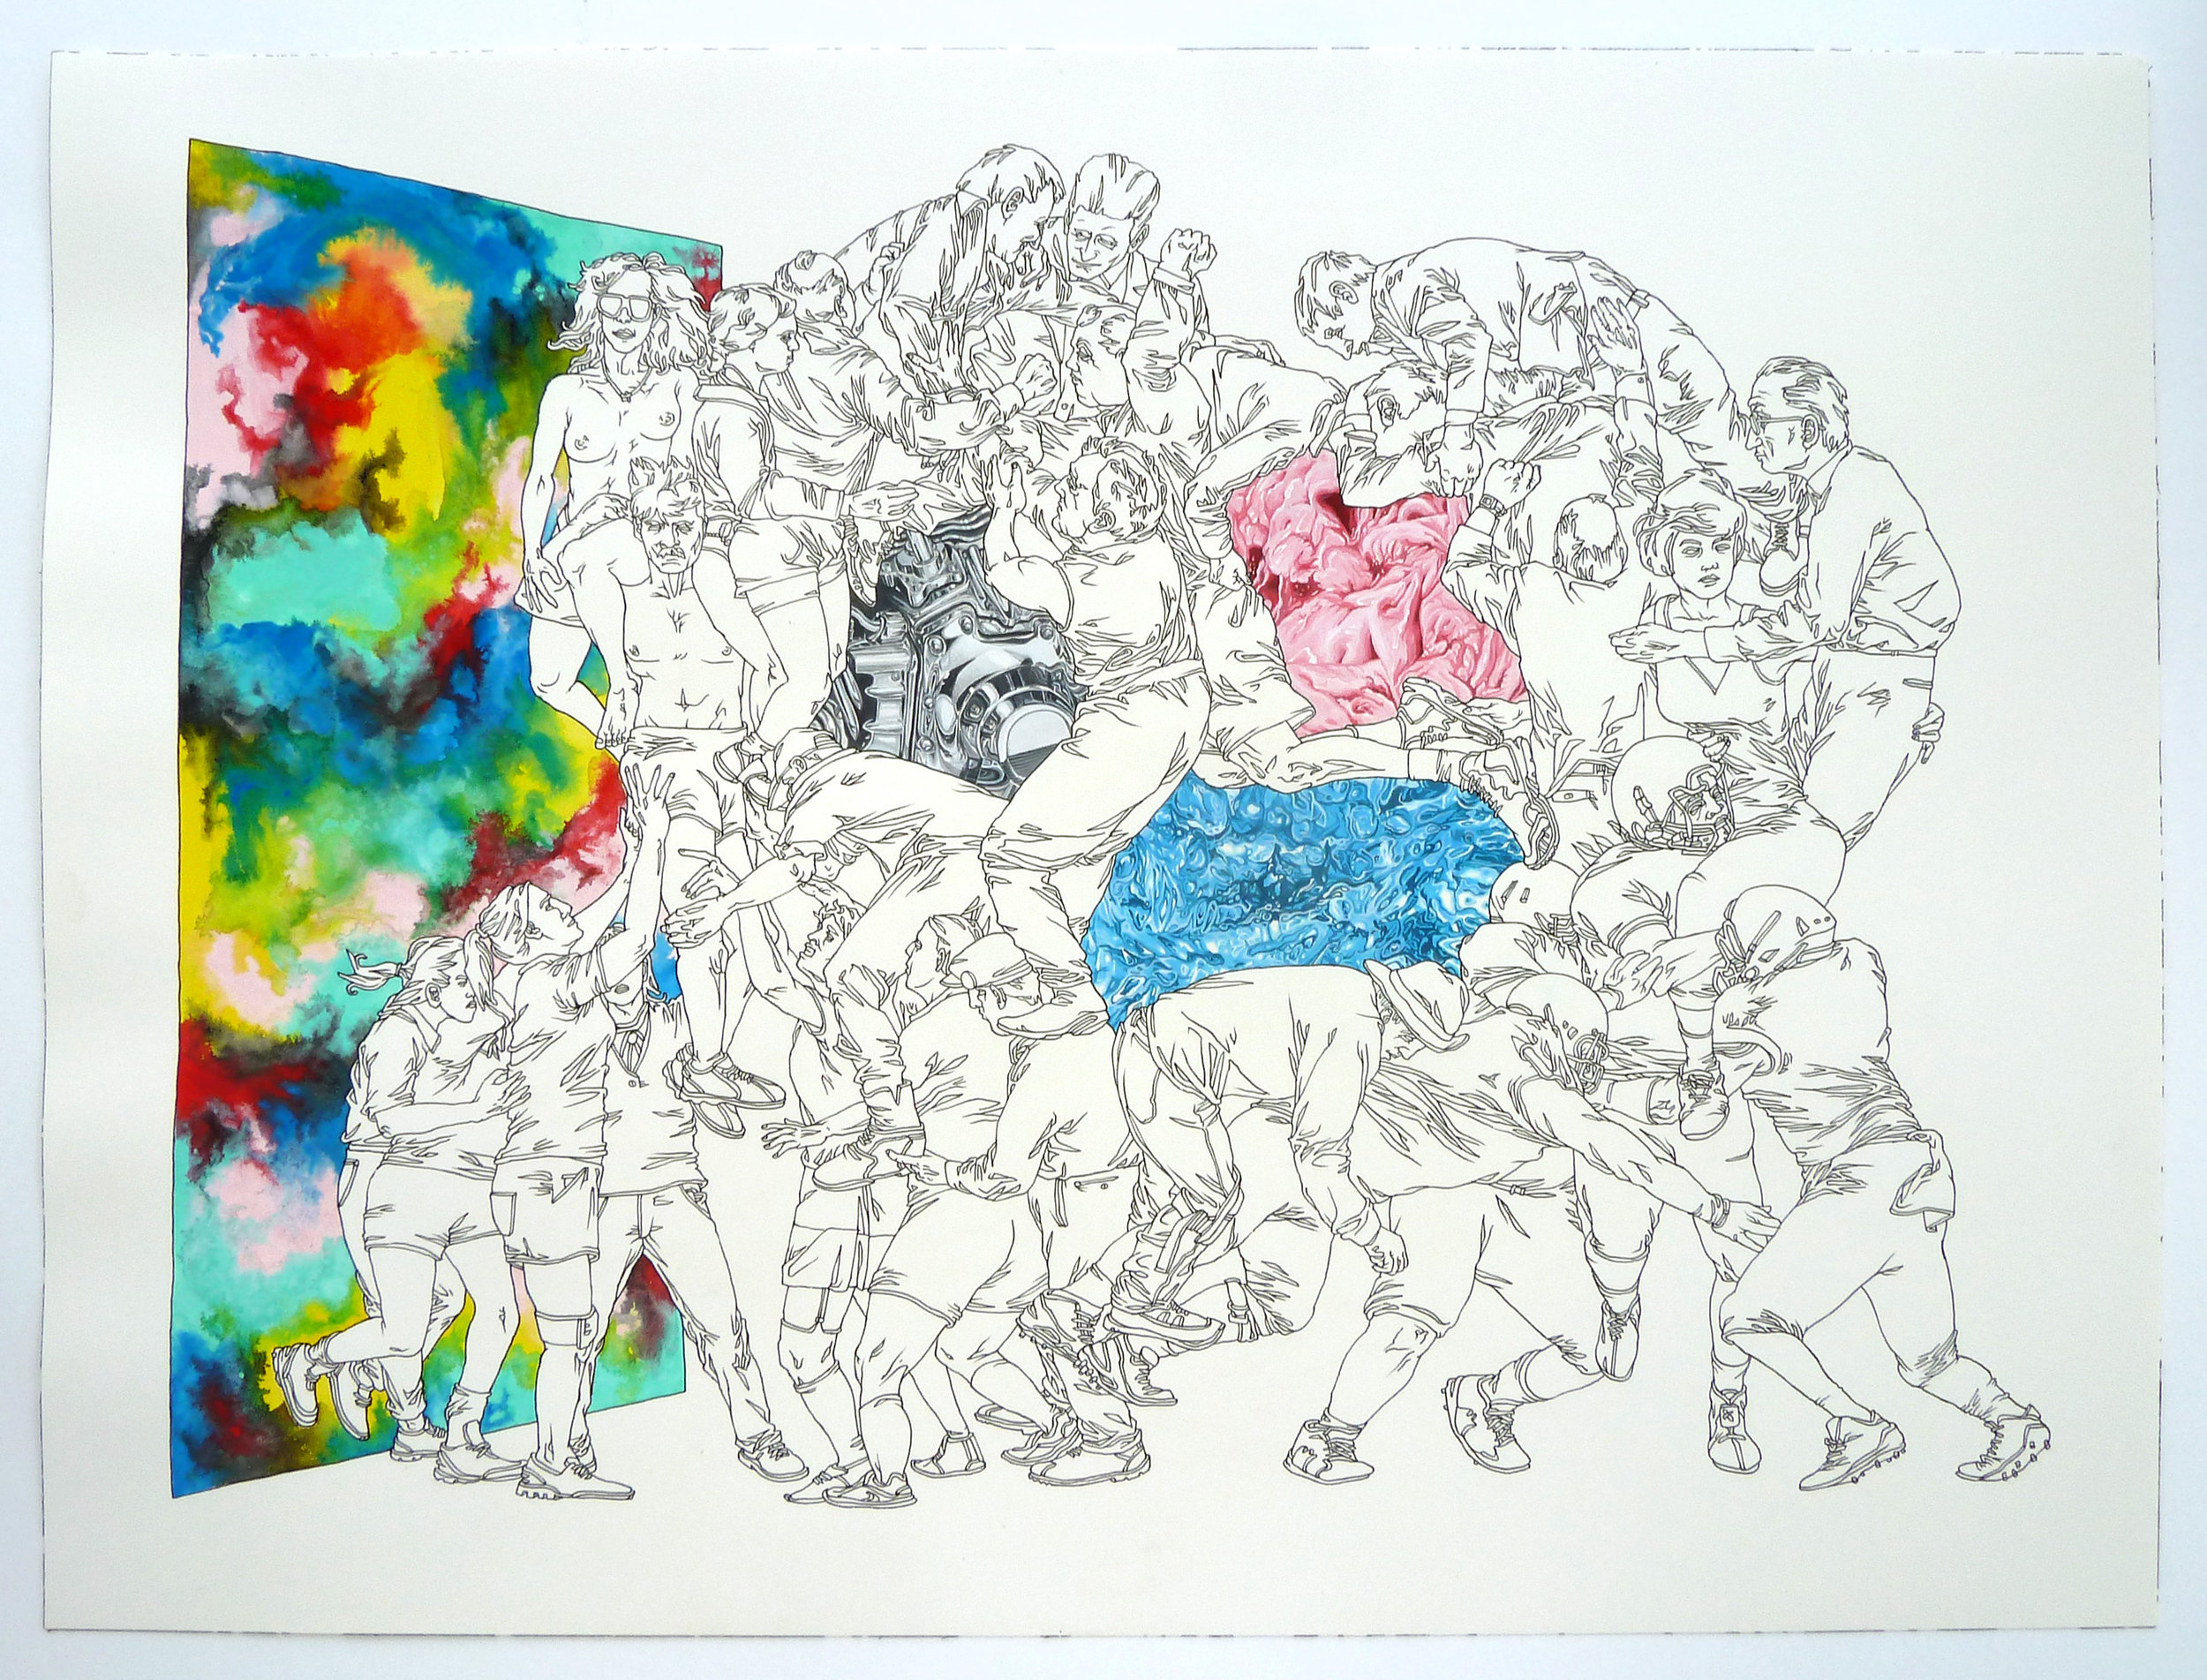 """Scrummage :o"" pen, watercolor and gouache on paper, 18""x24"""